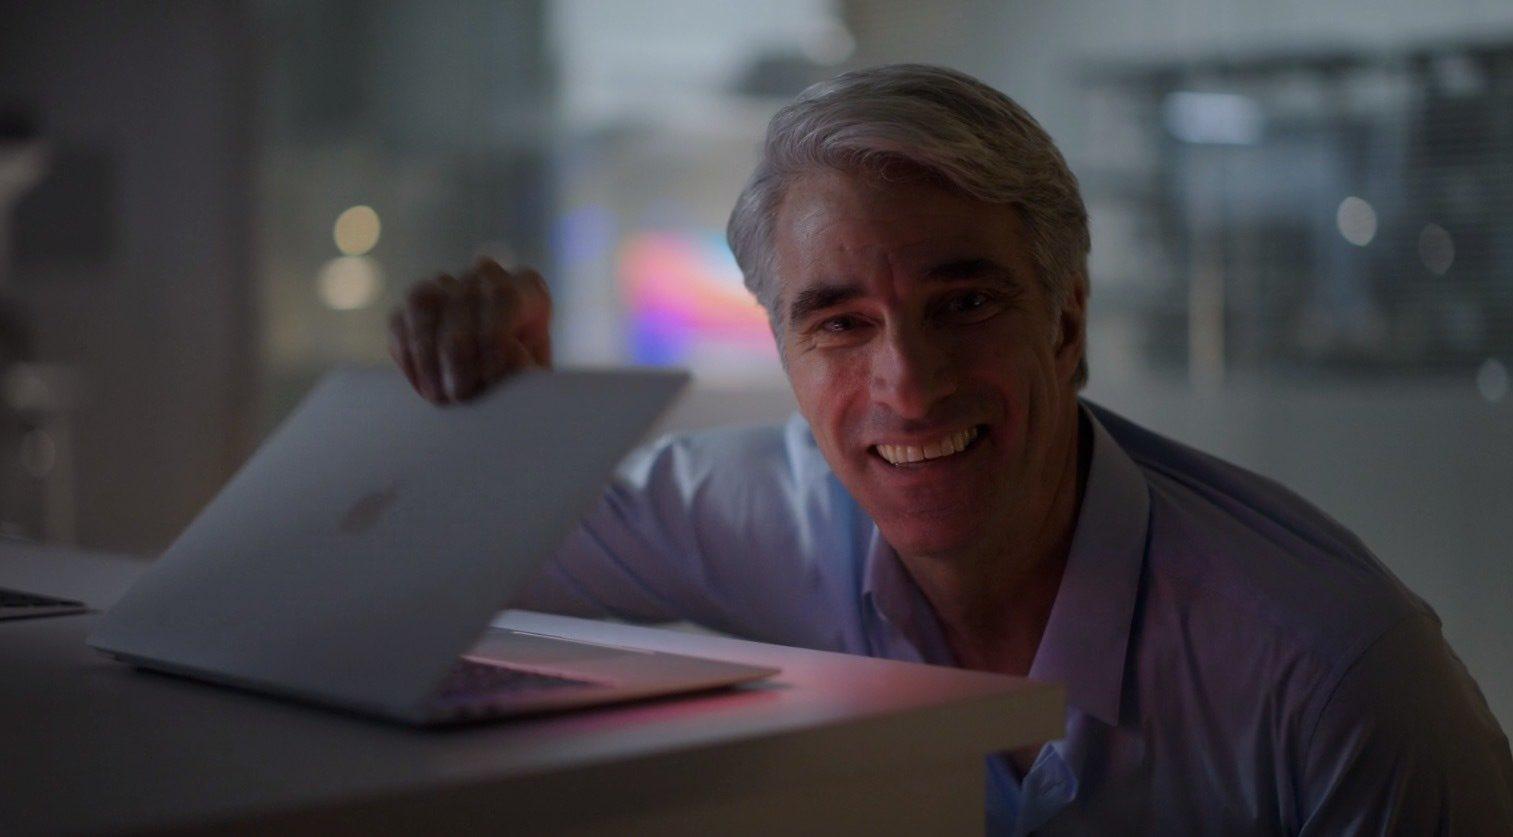 🤯 MacBook Air с чипом M1 набрал более 1 млн баллов в AnTuTu